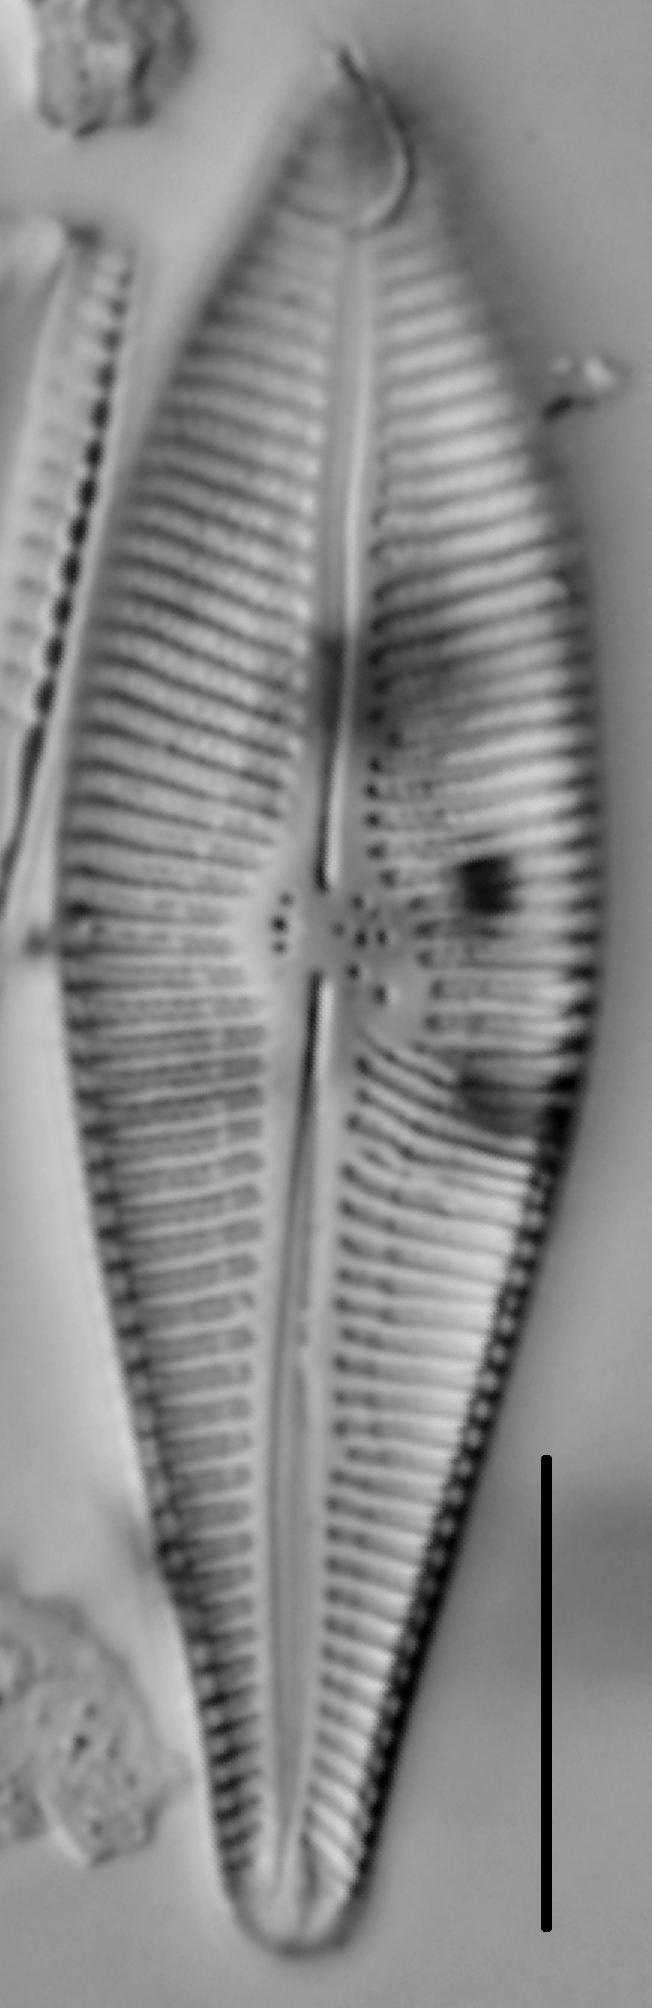 Gomphoneis eriense var. apiculata LM5